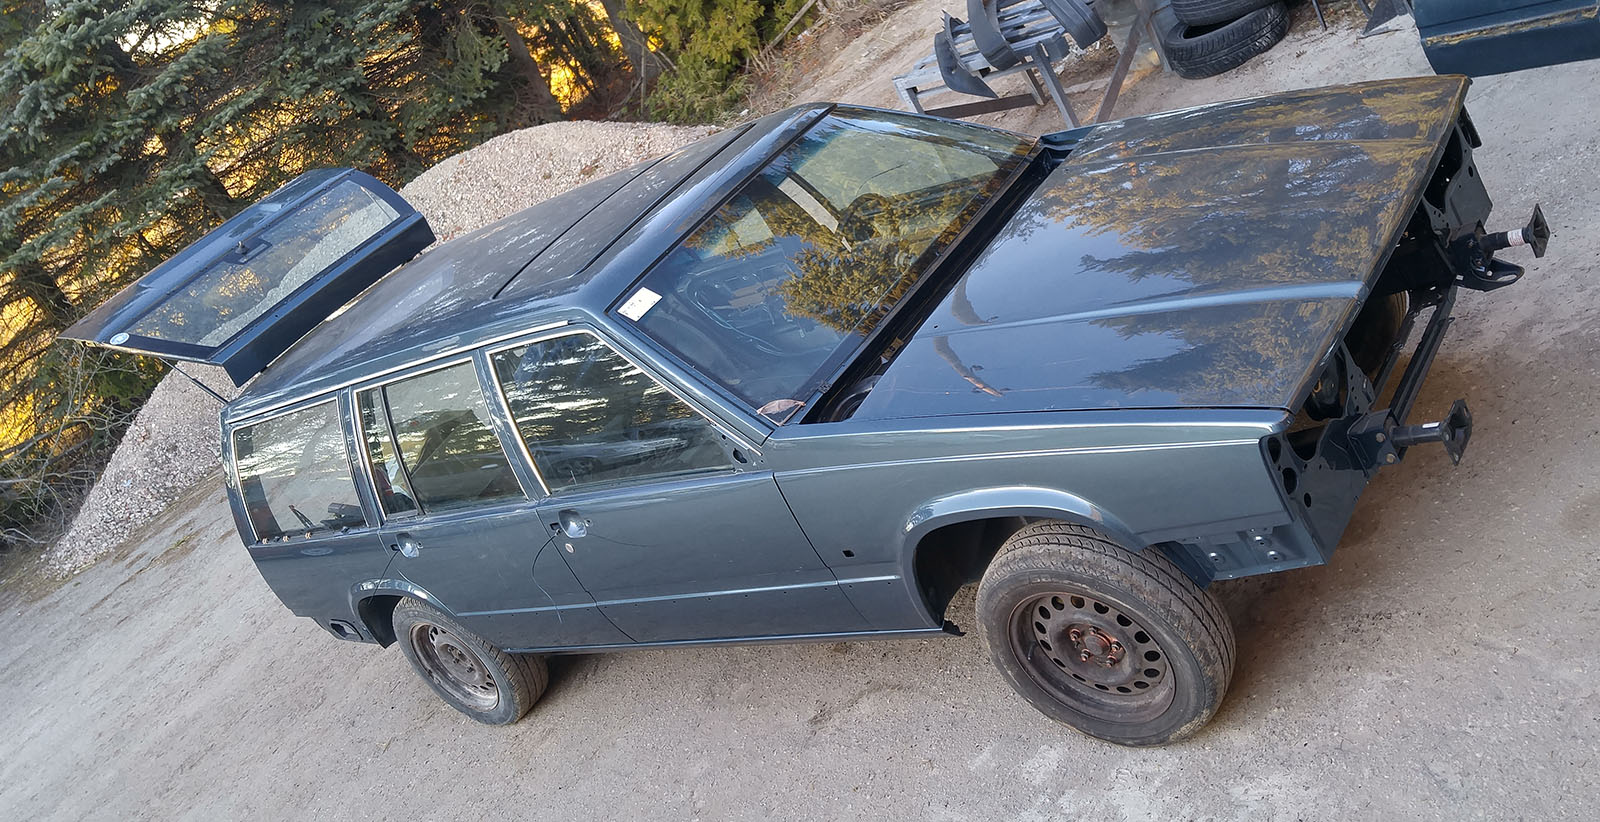 1989 Volvo 745 full restoration